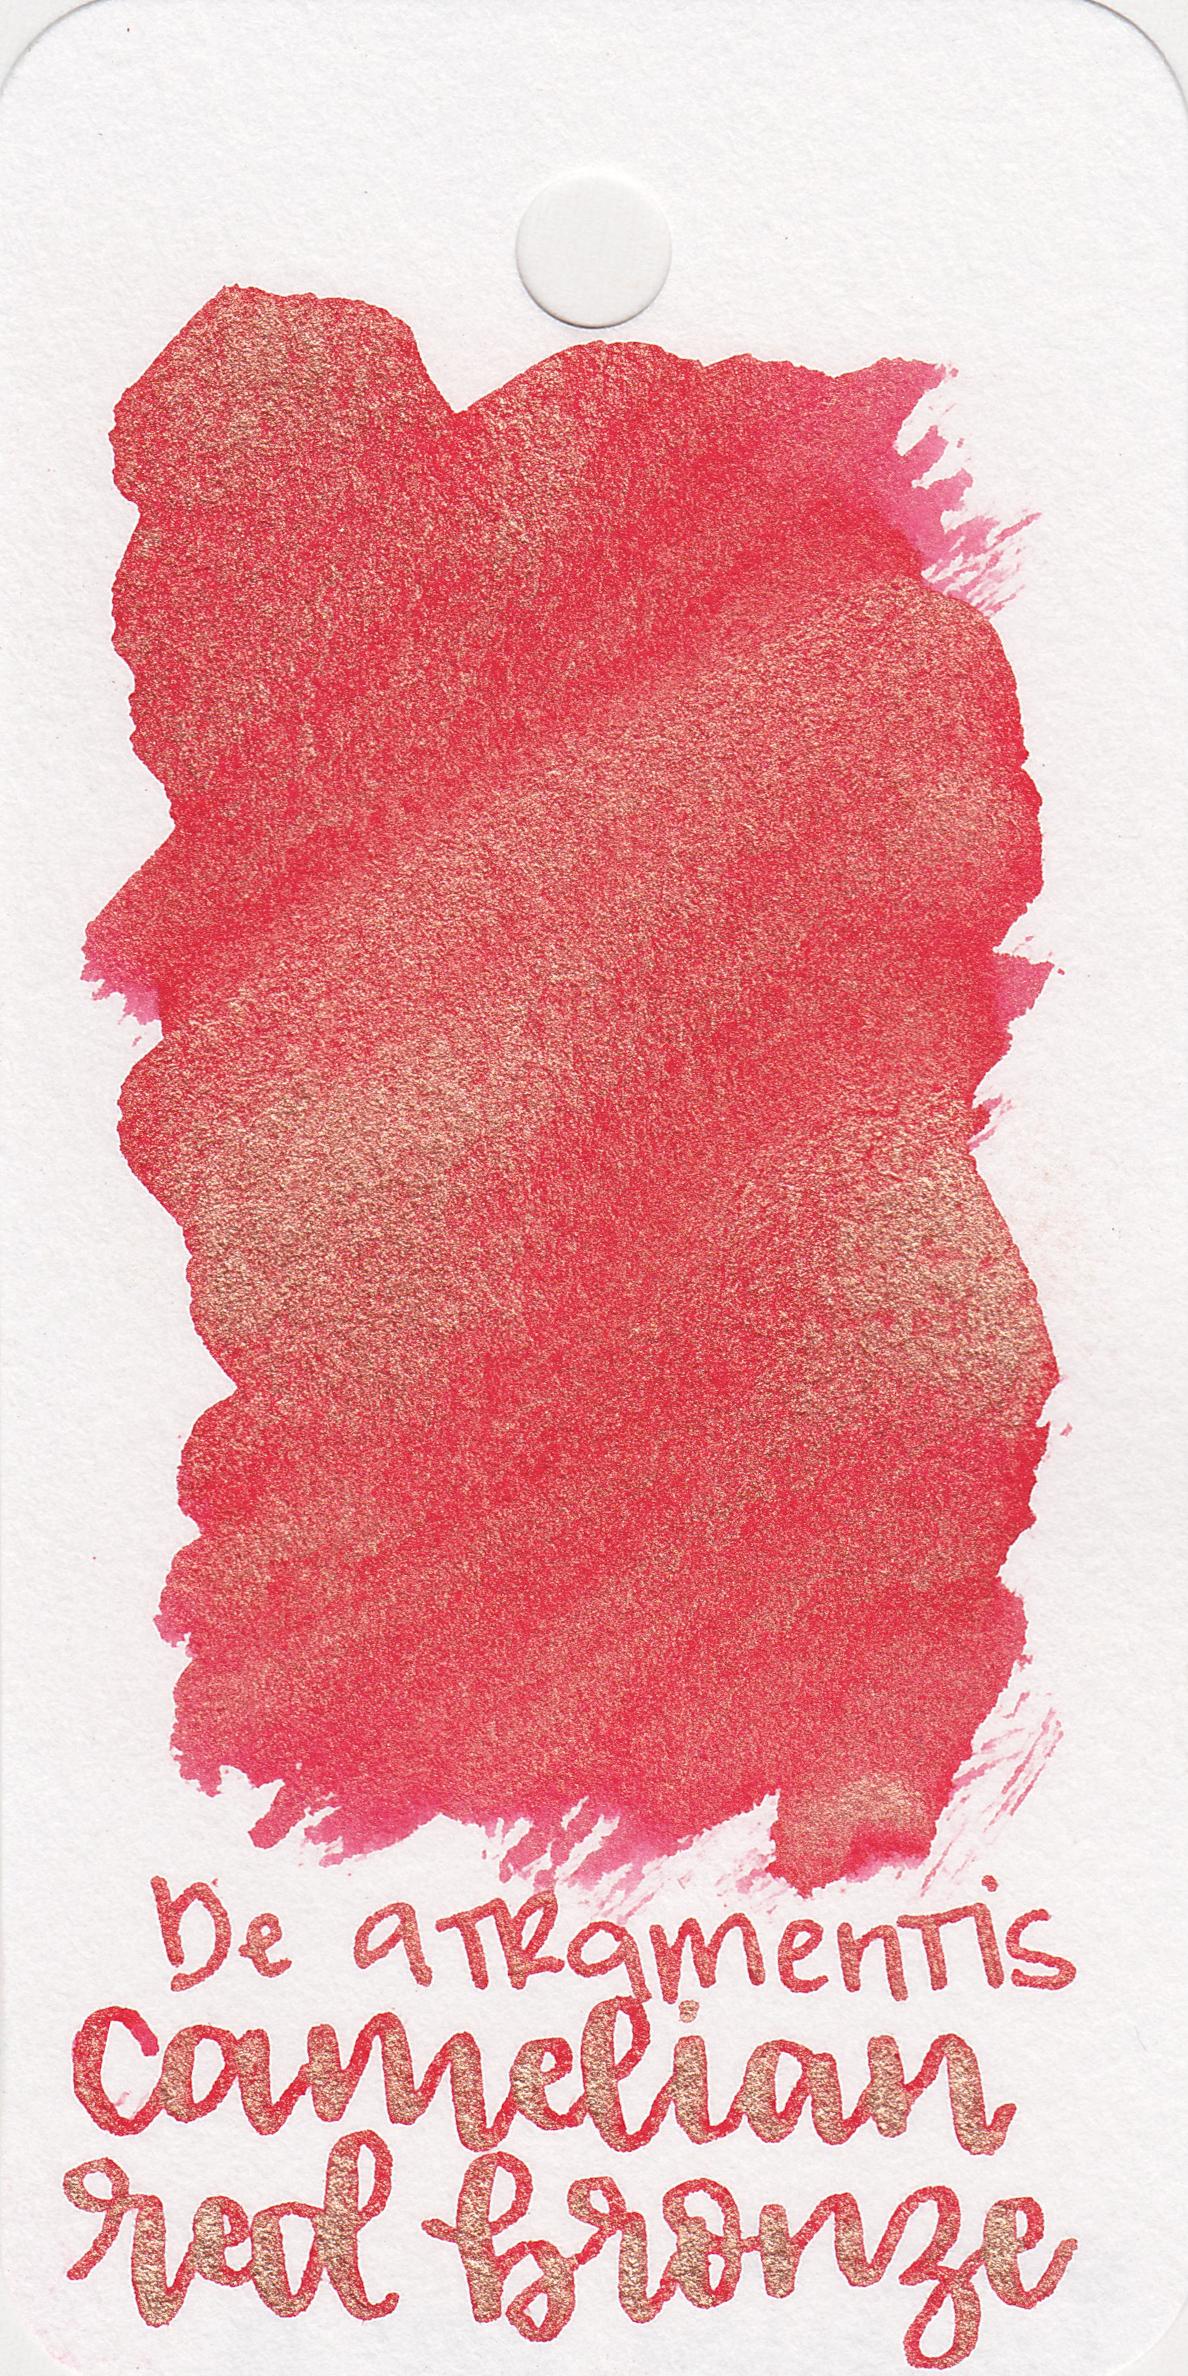 da-camelian-red-3.jpg